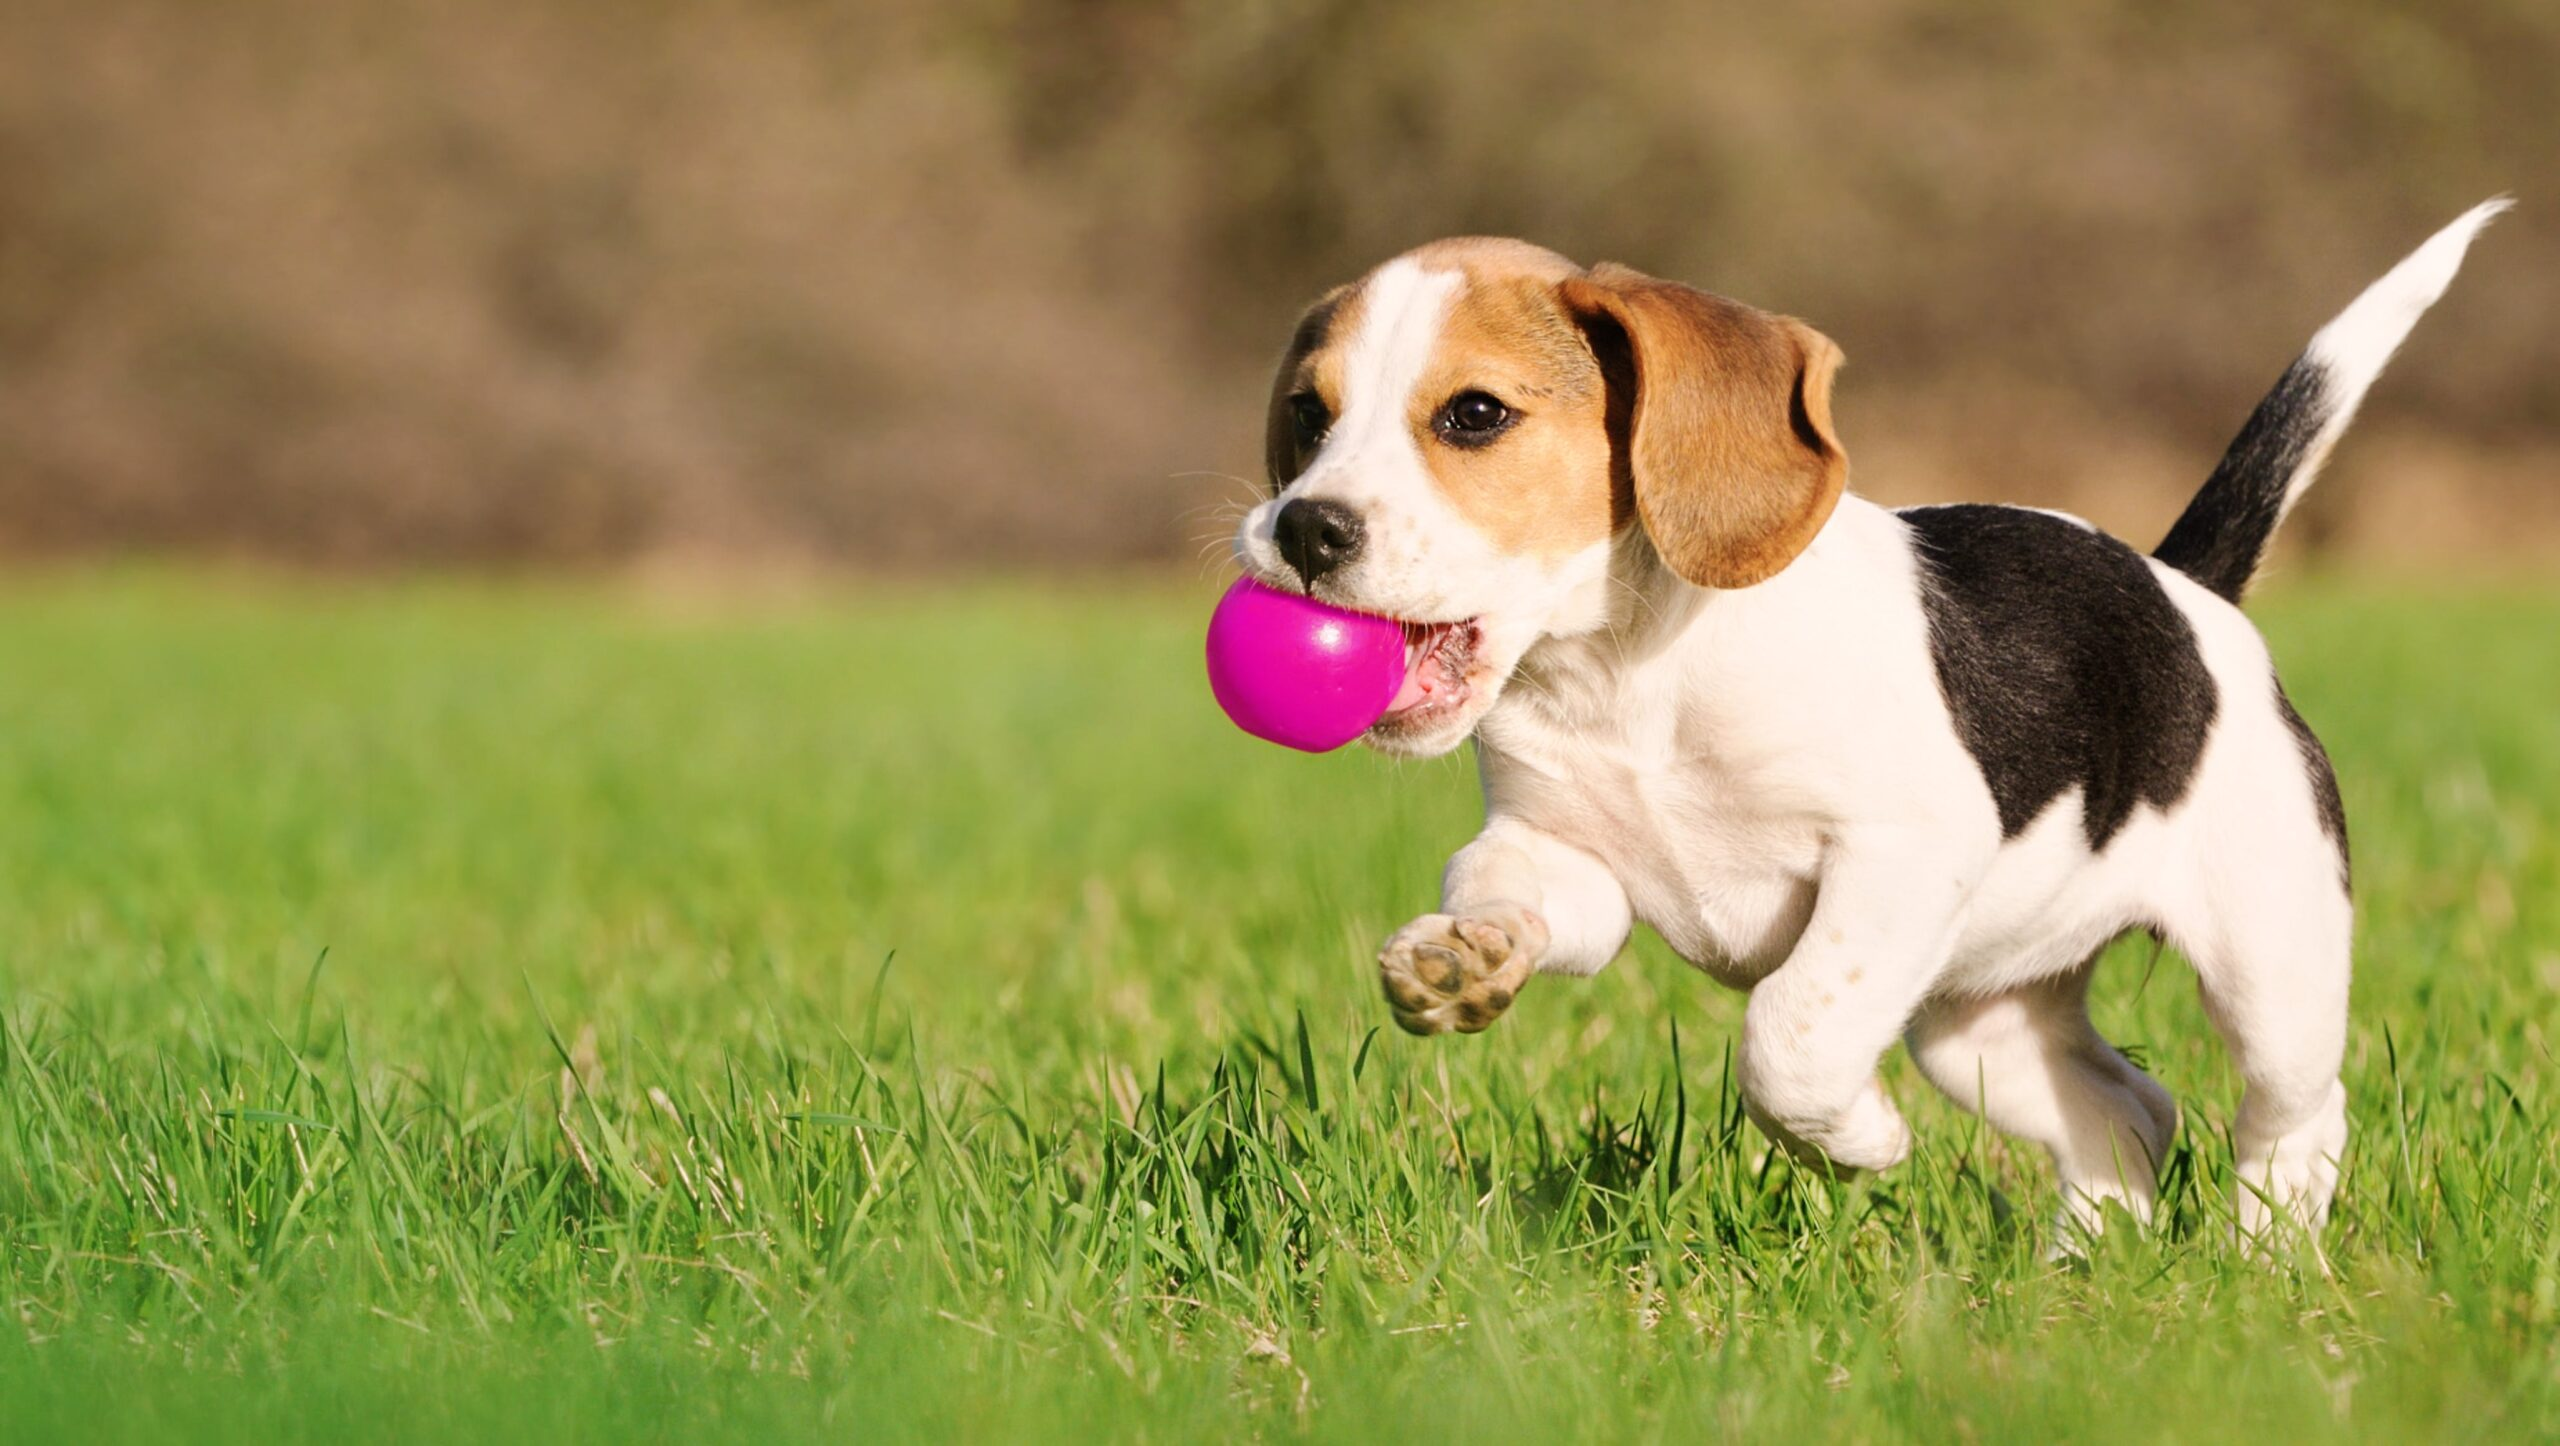 eukanuba-market-image-puppy-beagle